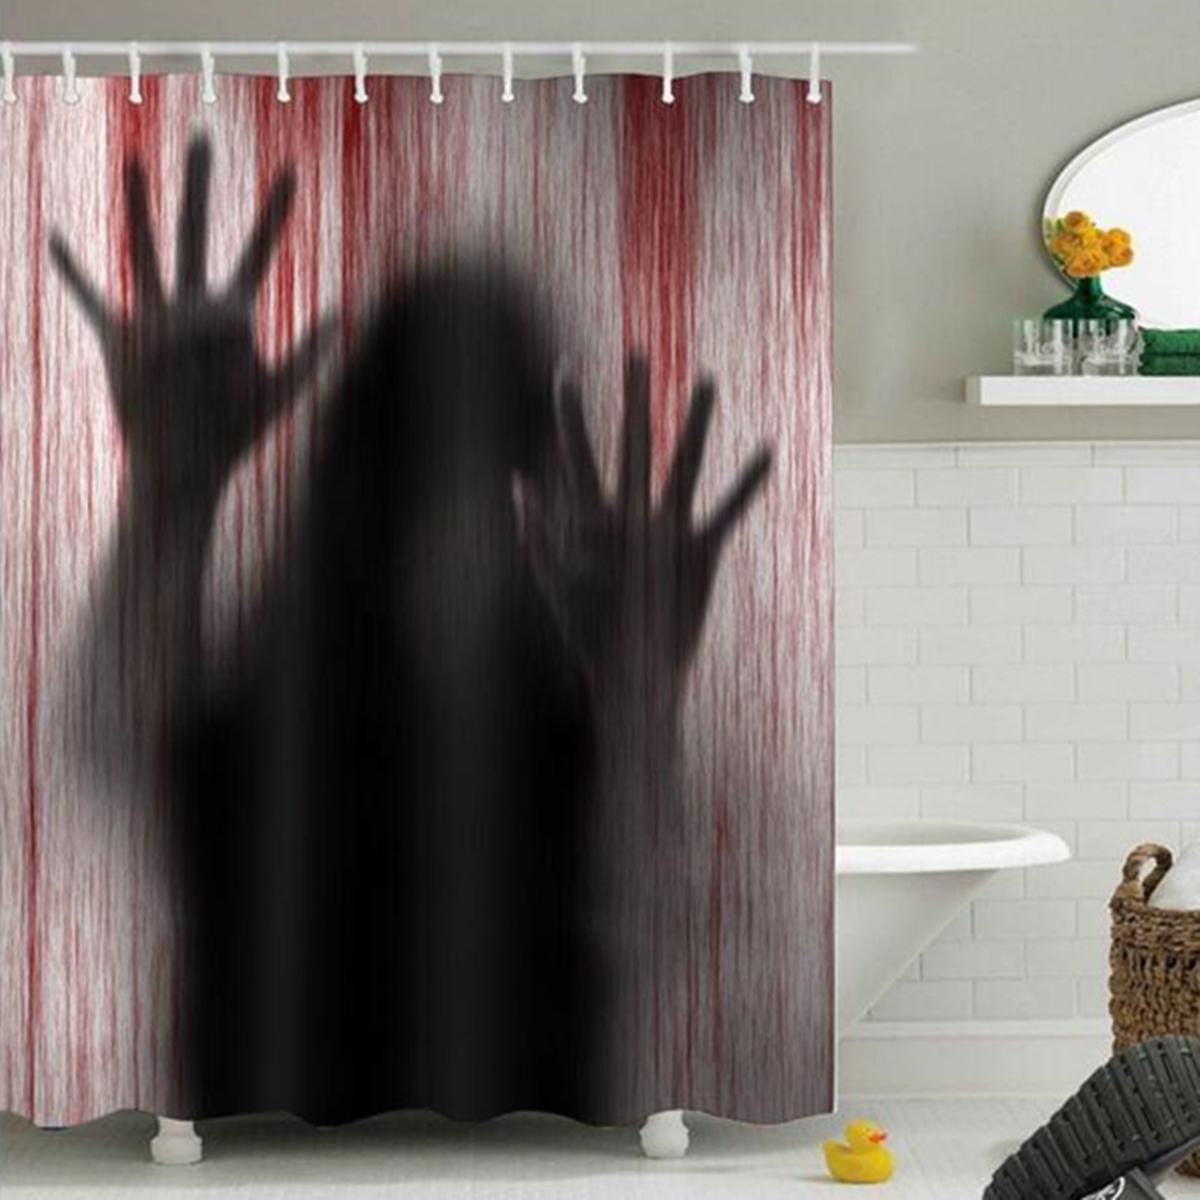 Halloween Horror Creepy Shower Curtain 3D Printed Bathroom